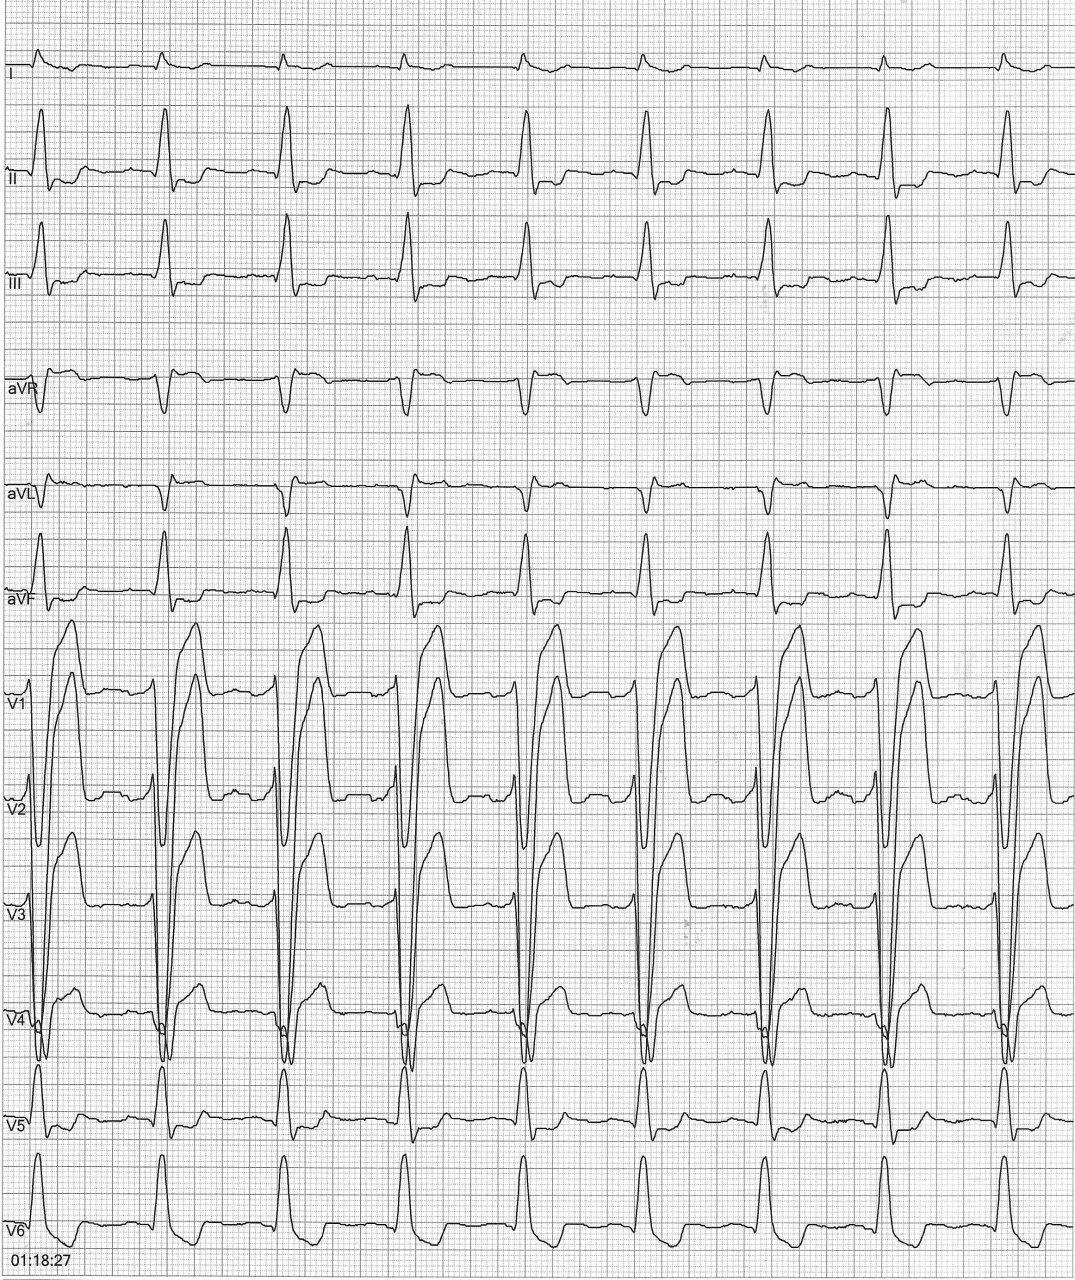 Paciente masculino de 55 años,  diabético, asintomático que presenta signos ECG de miocardiopatía isquémica y presencia de hipoquinesia difusa a predominio de cara anterior